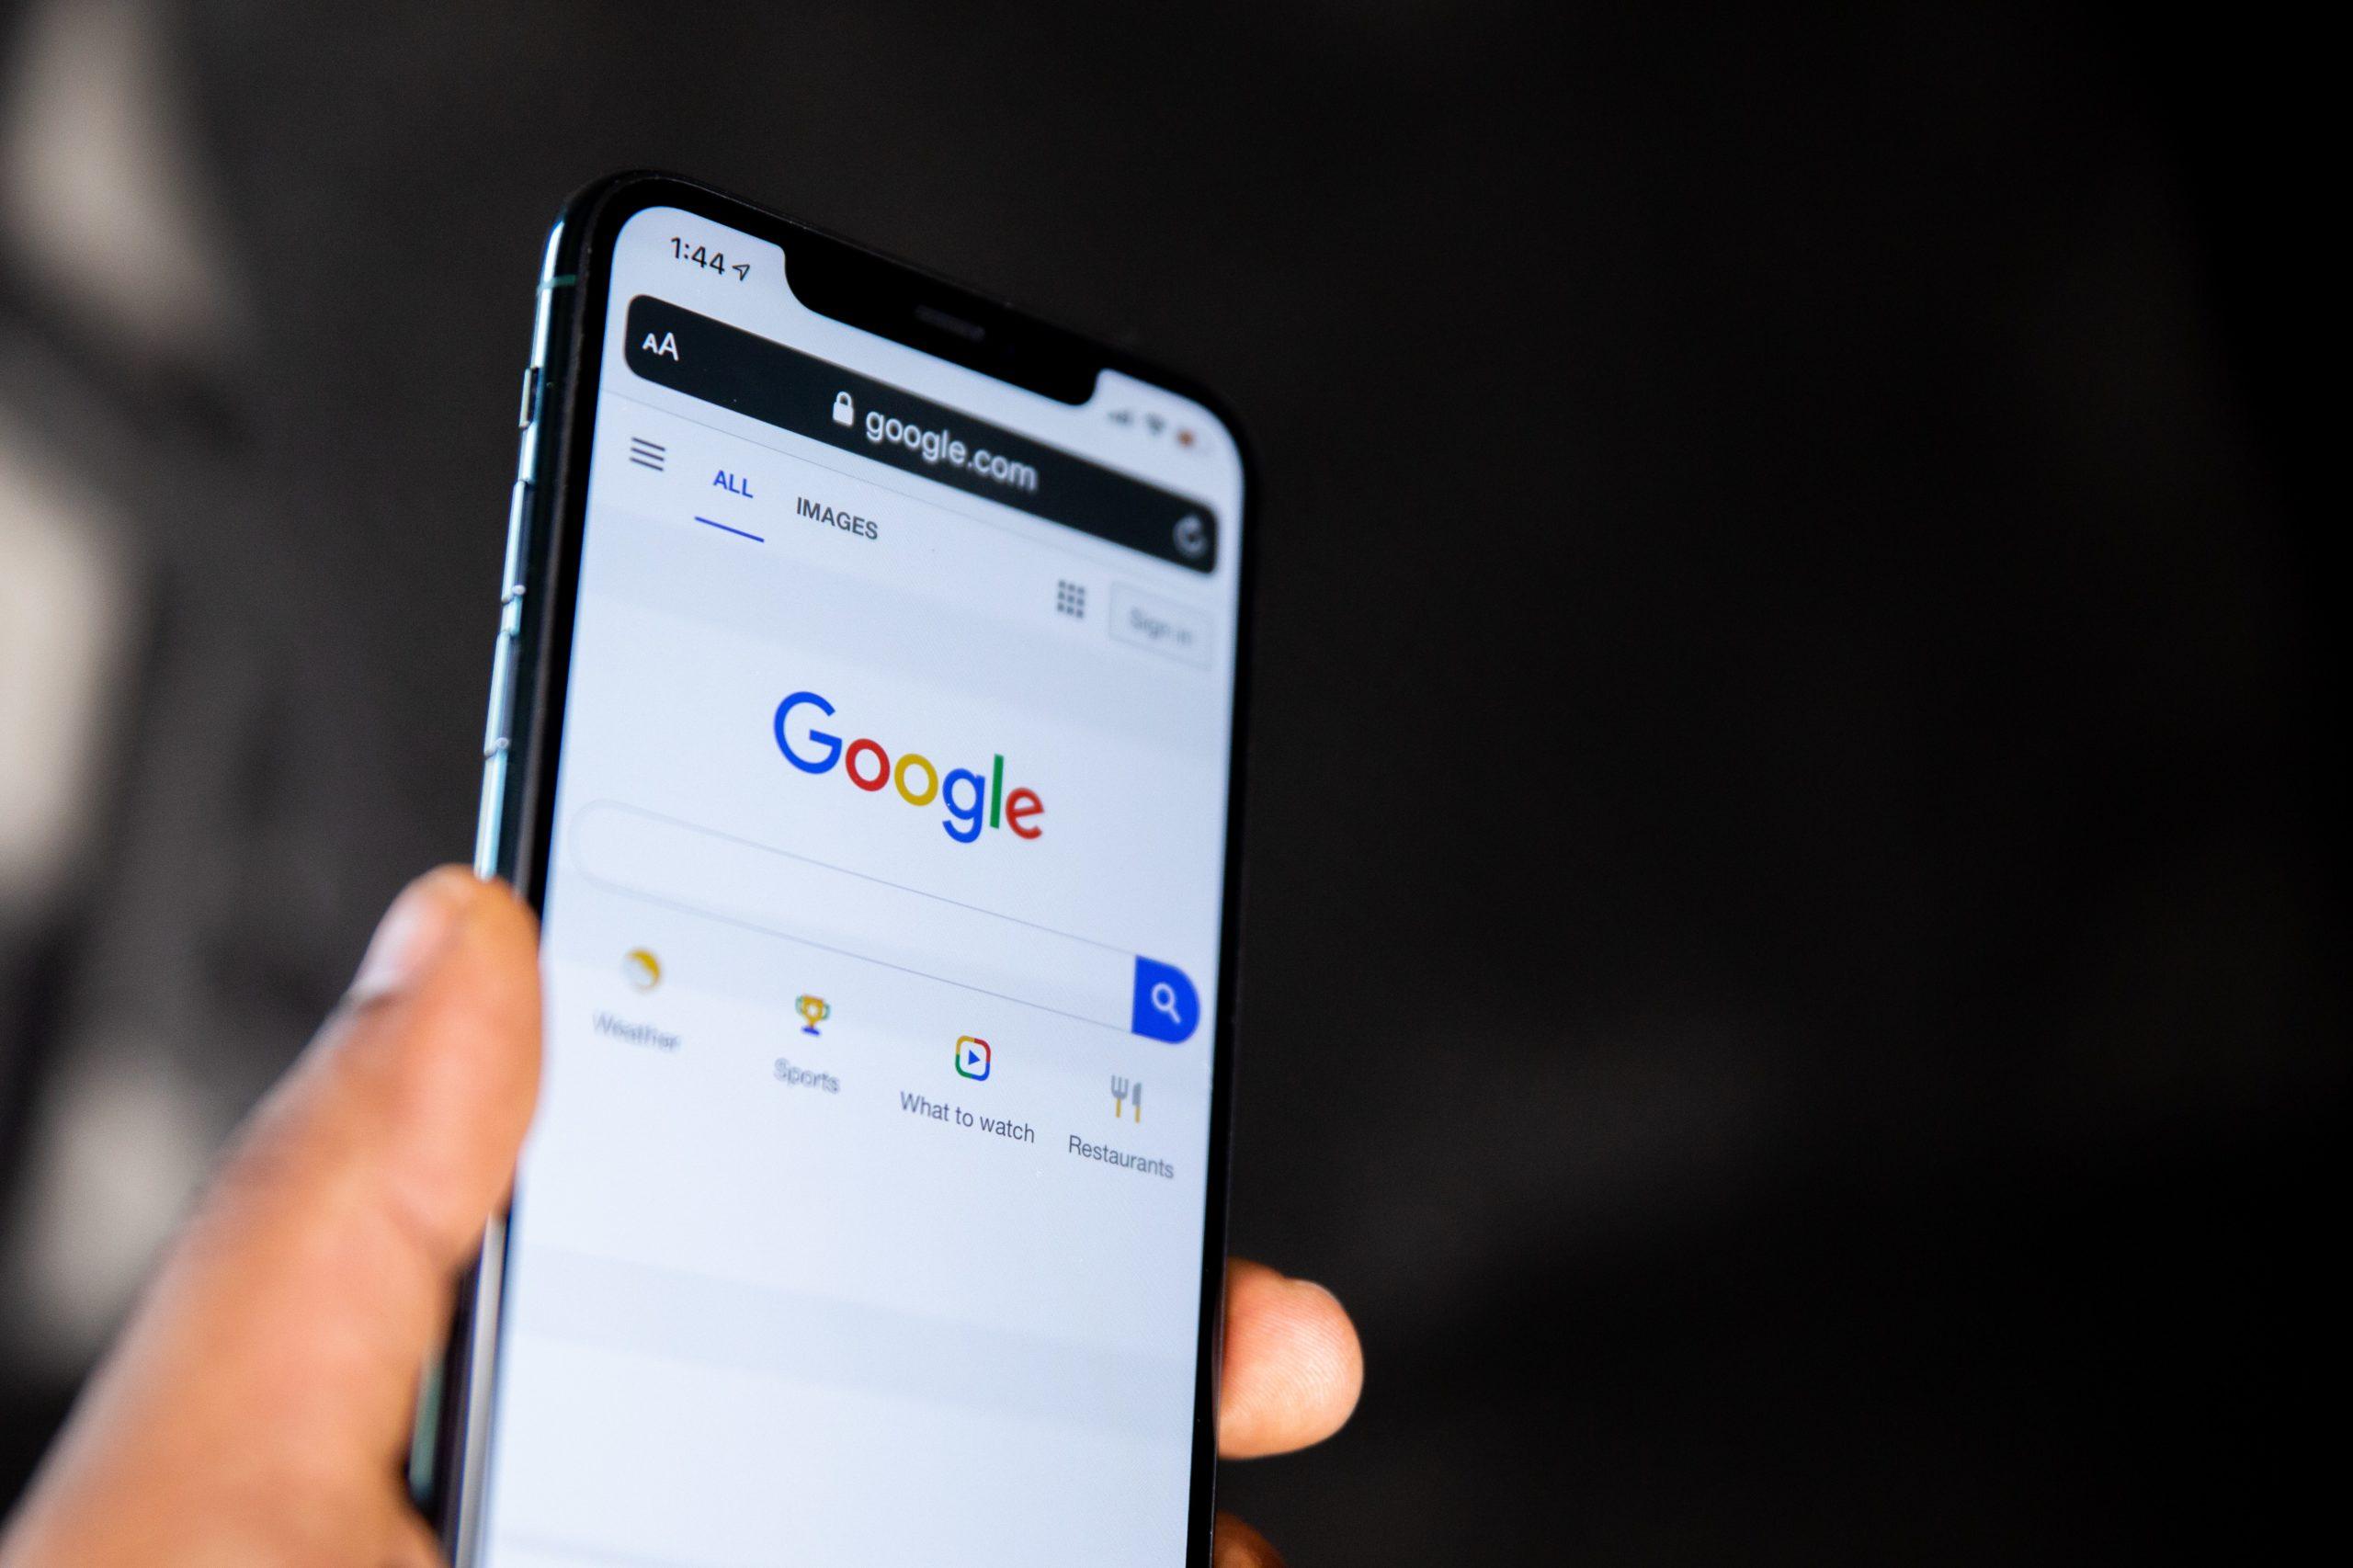 Jon Kabat-Zinn leads a talk about Mindfulness at Google